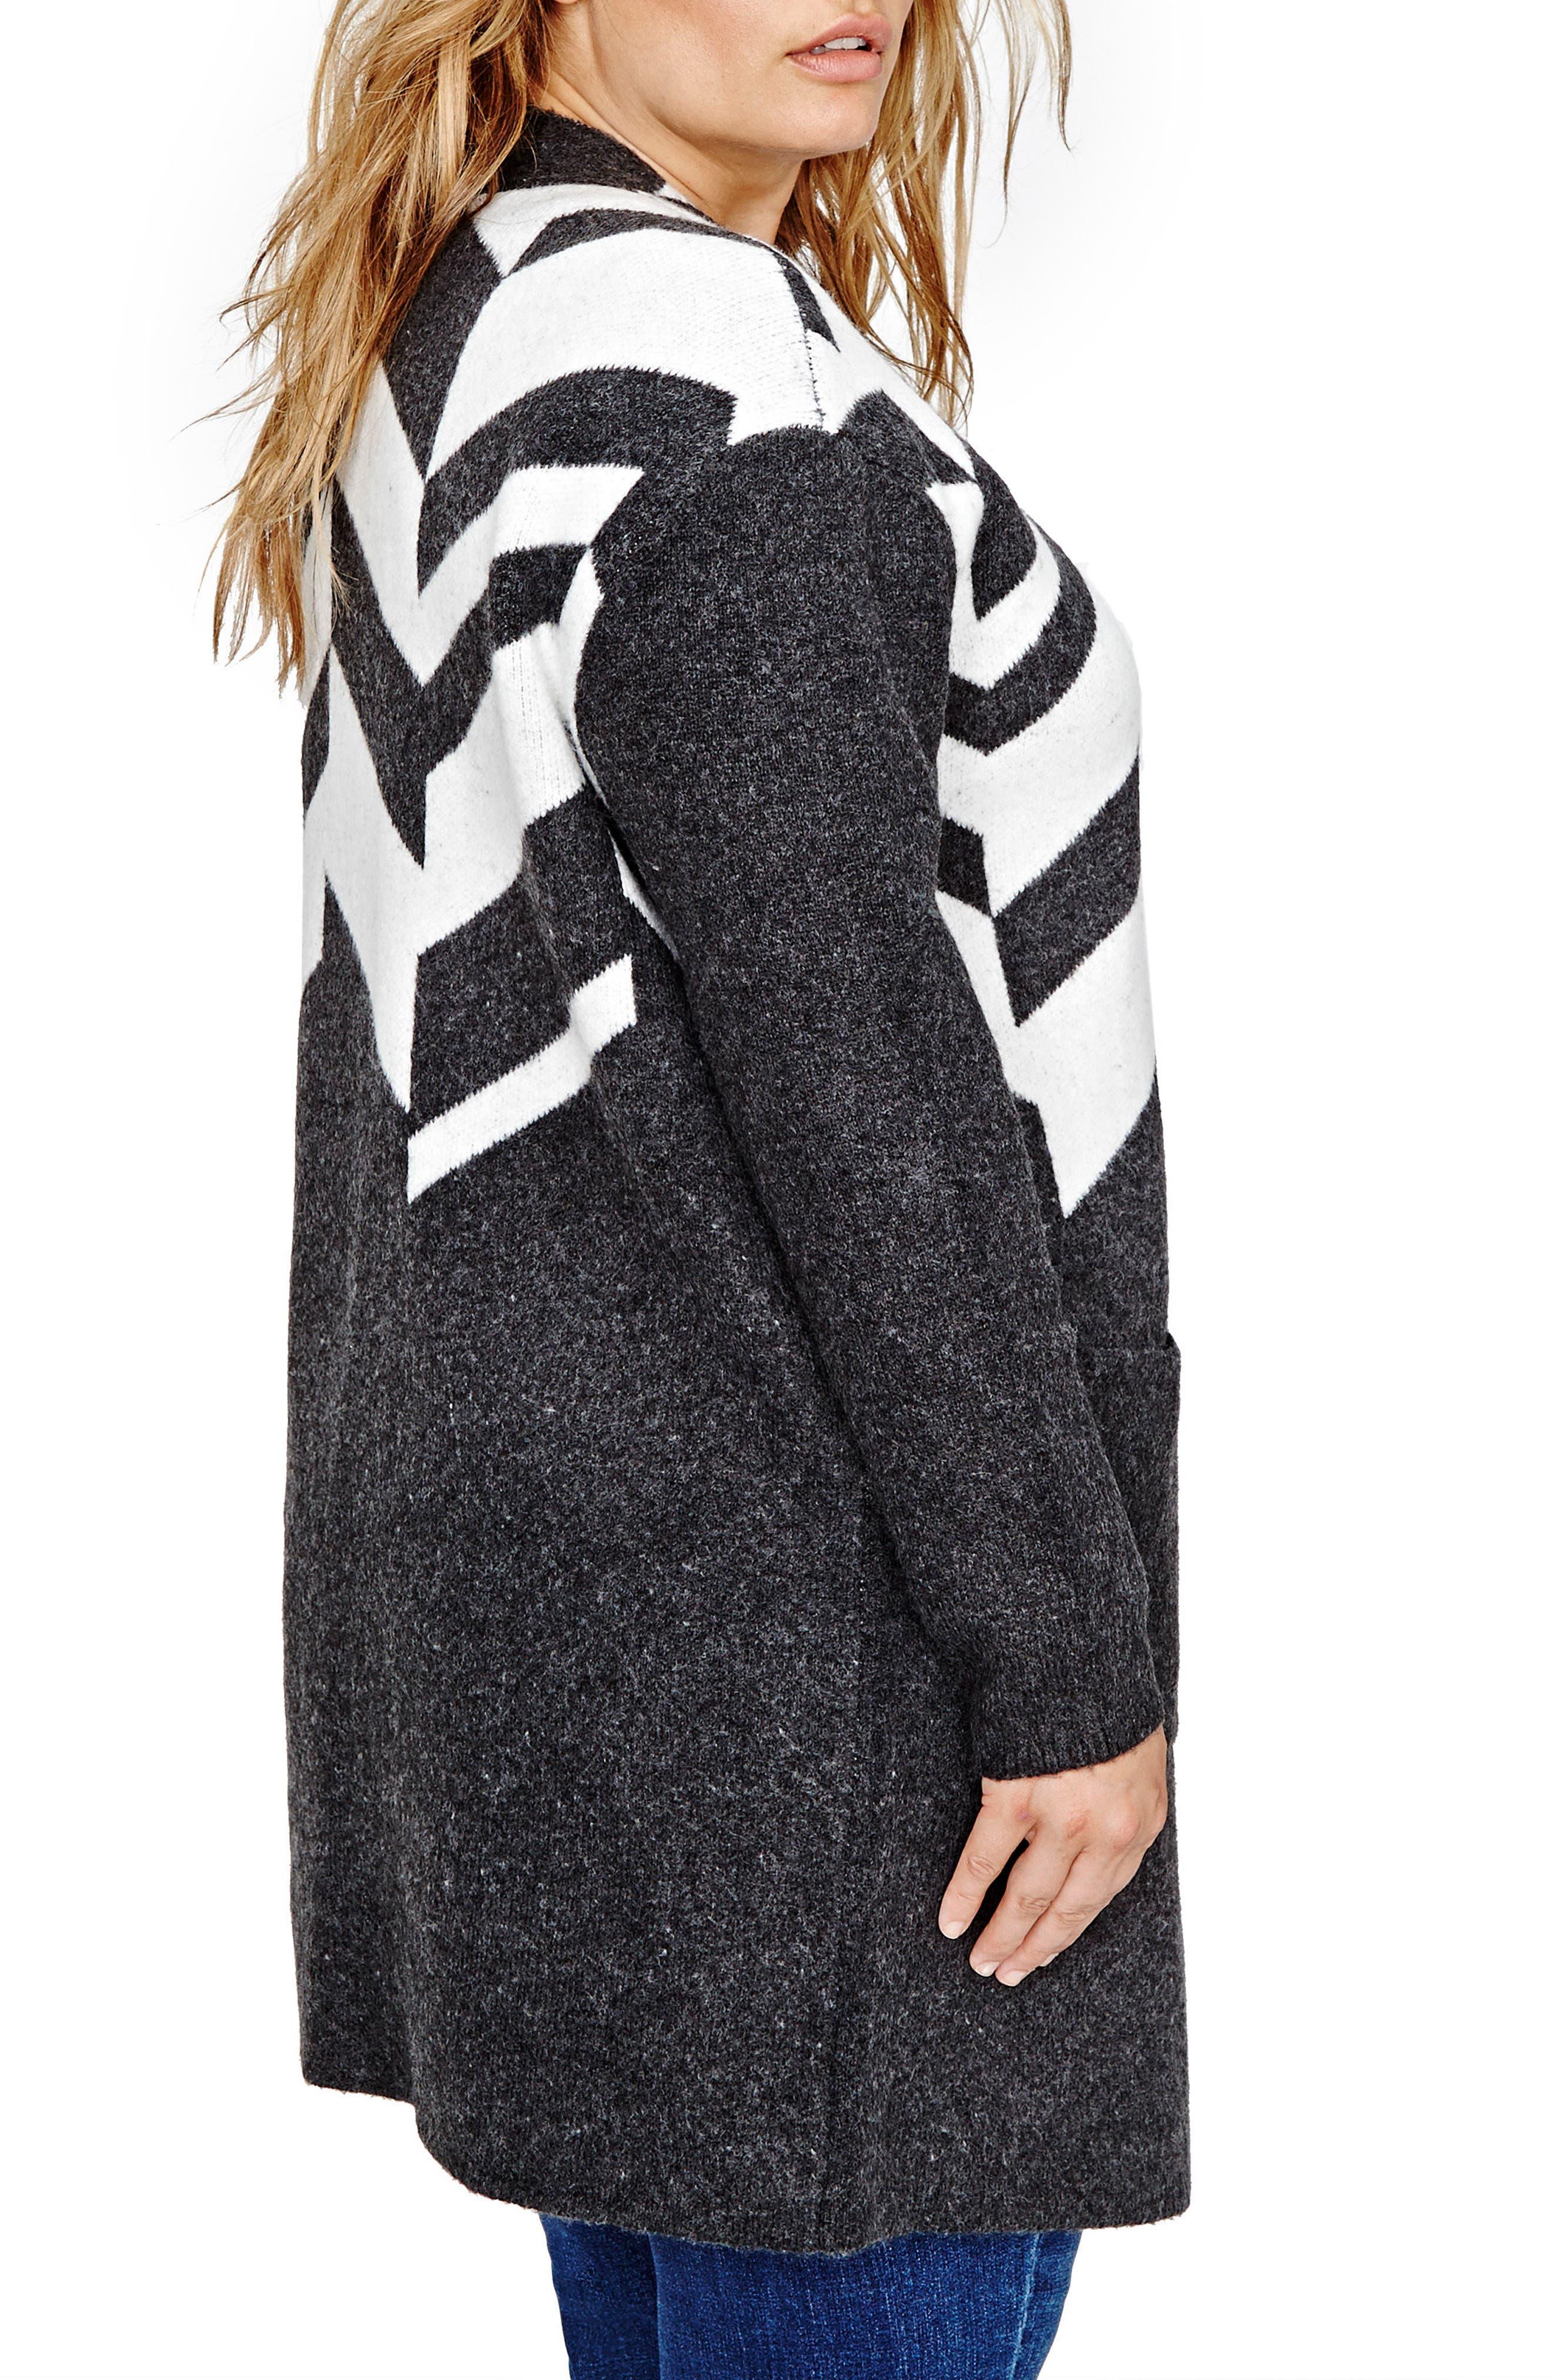 Patterned Sweater Coat,                             Alternate thumbnail 2, color,                             Ash Grey Mix - B85